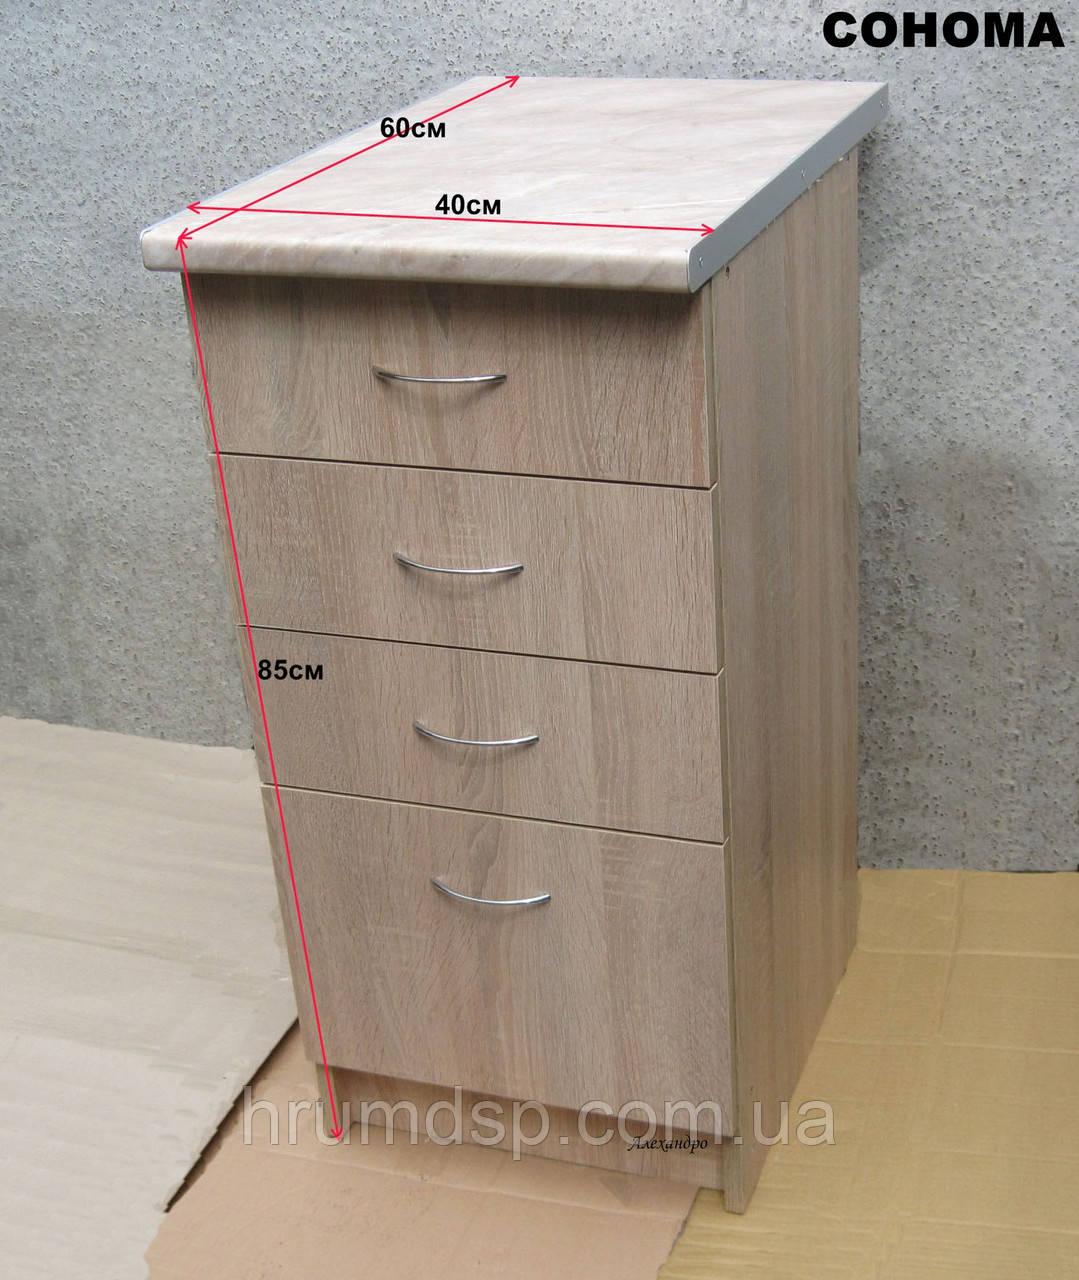 Стол тумба четыре ящика 40х60 (10цв)